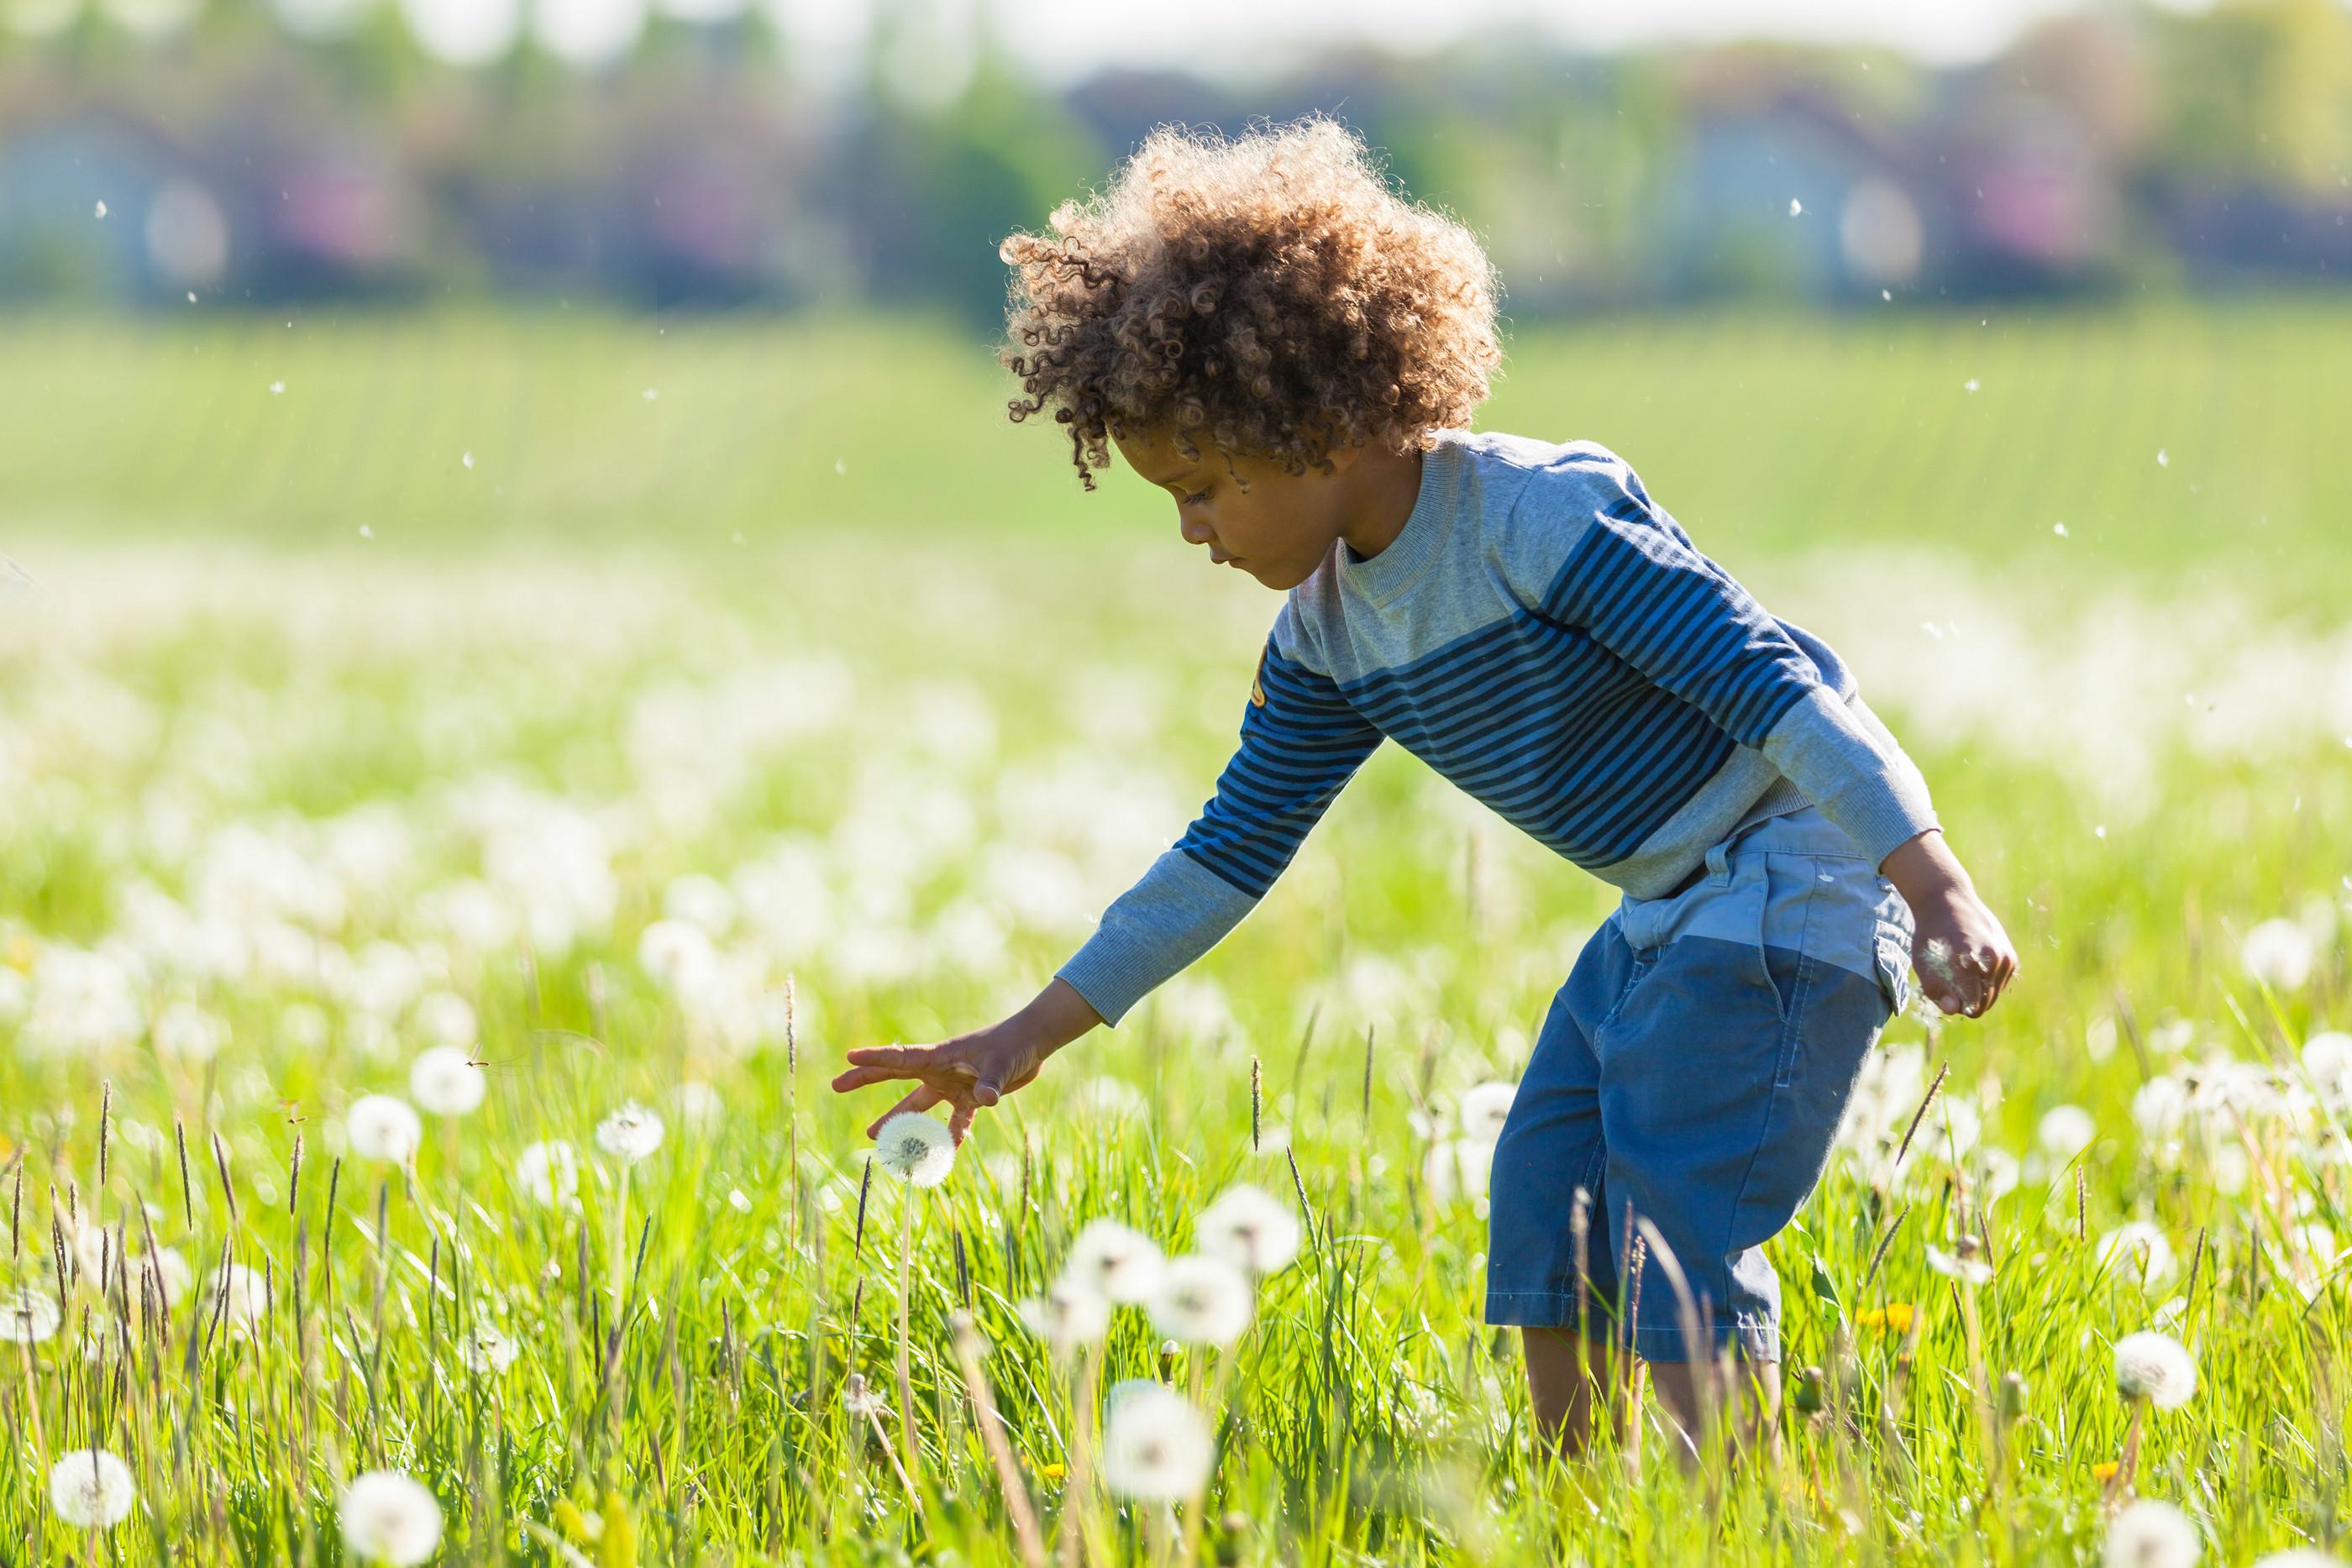 bigstock-African-boy-kid-allergies-spring-63560041